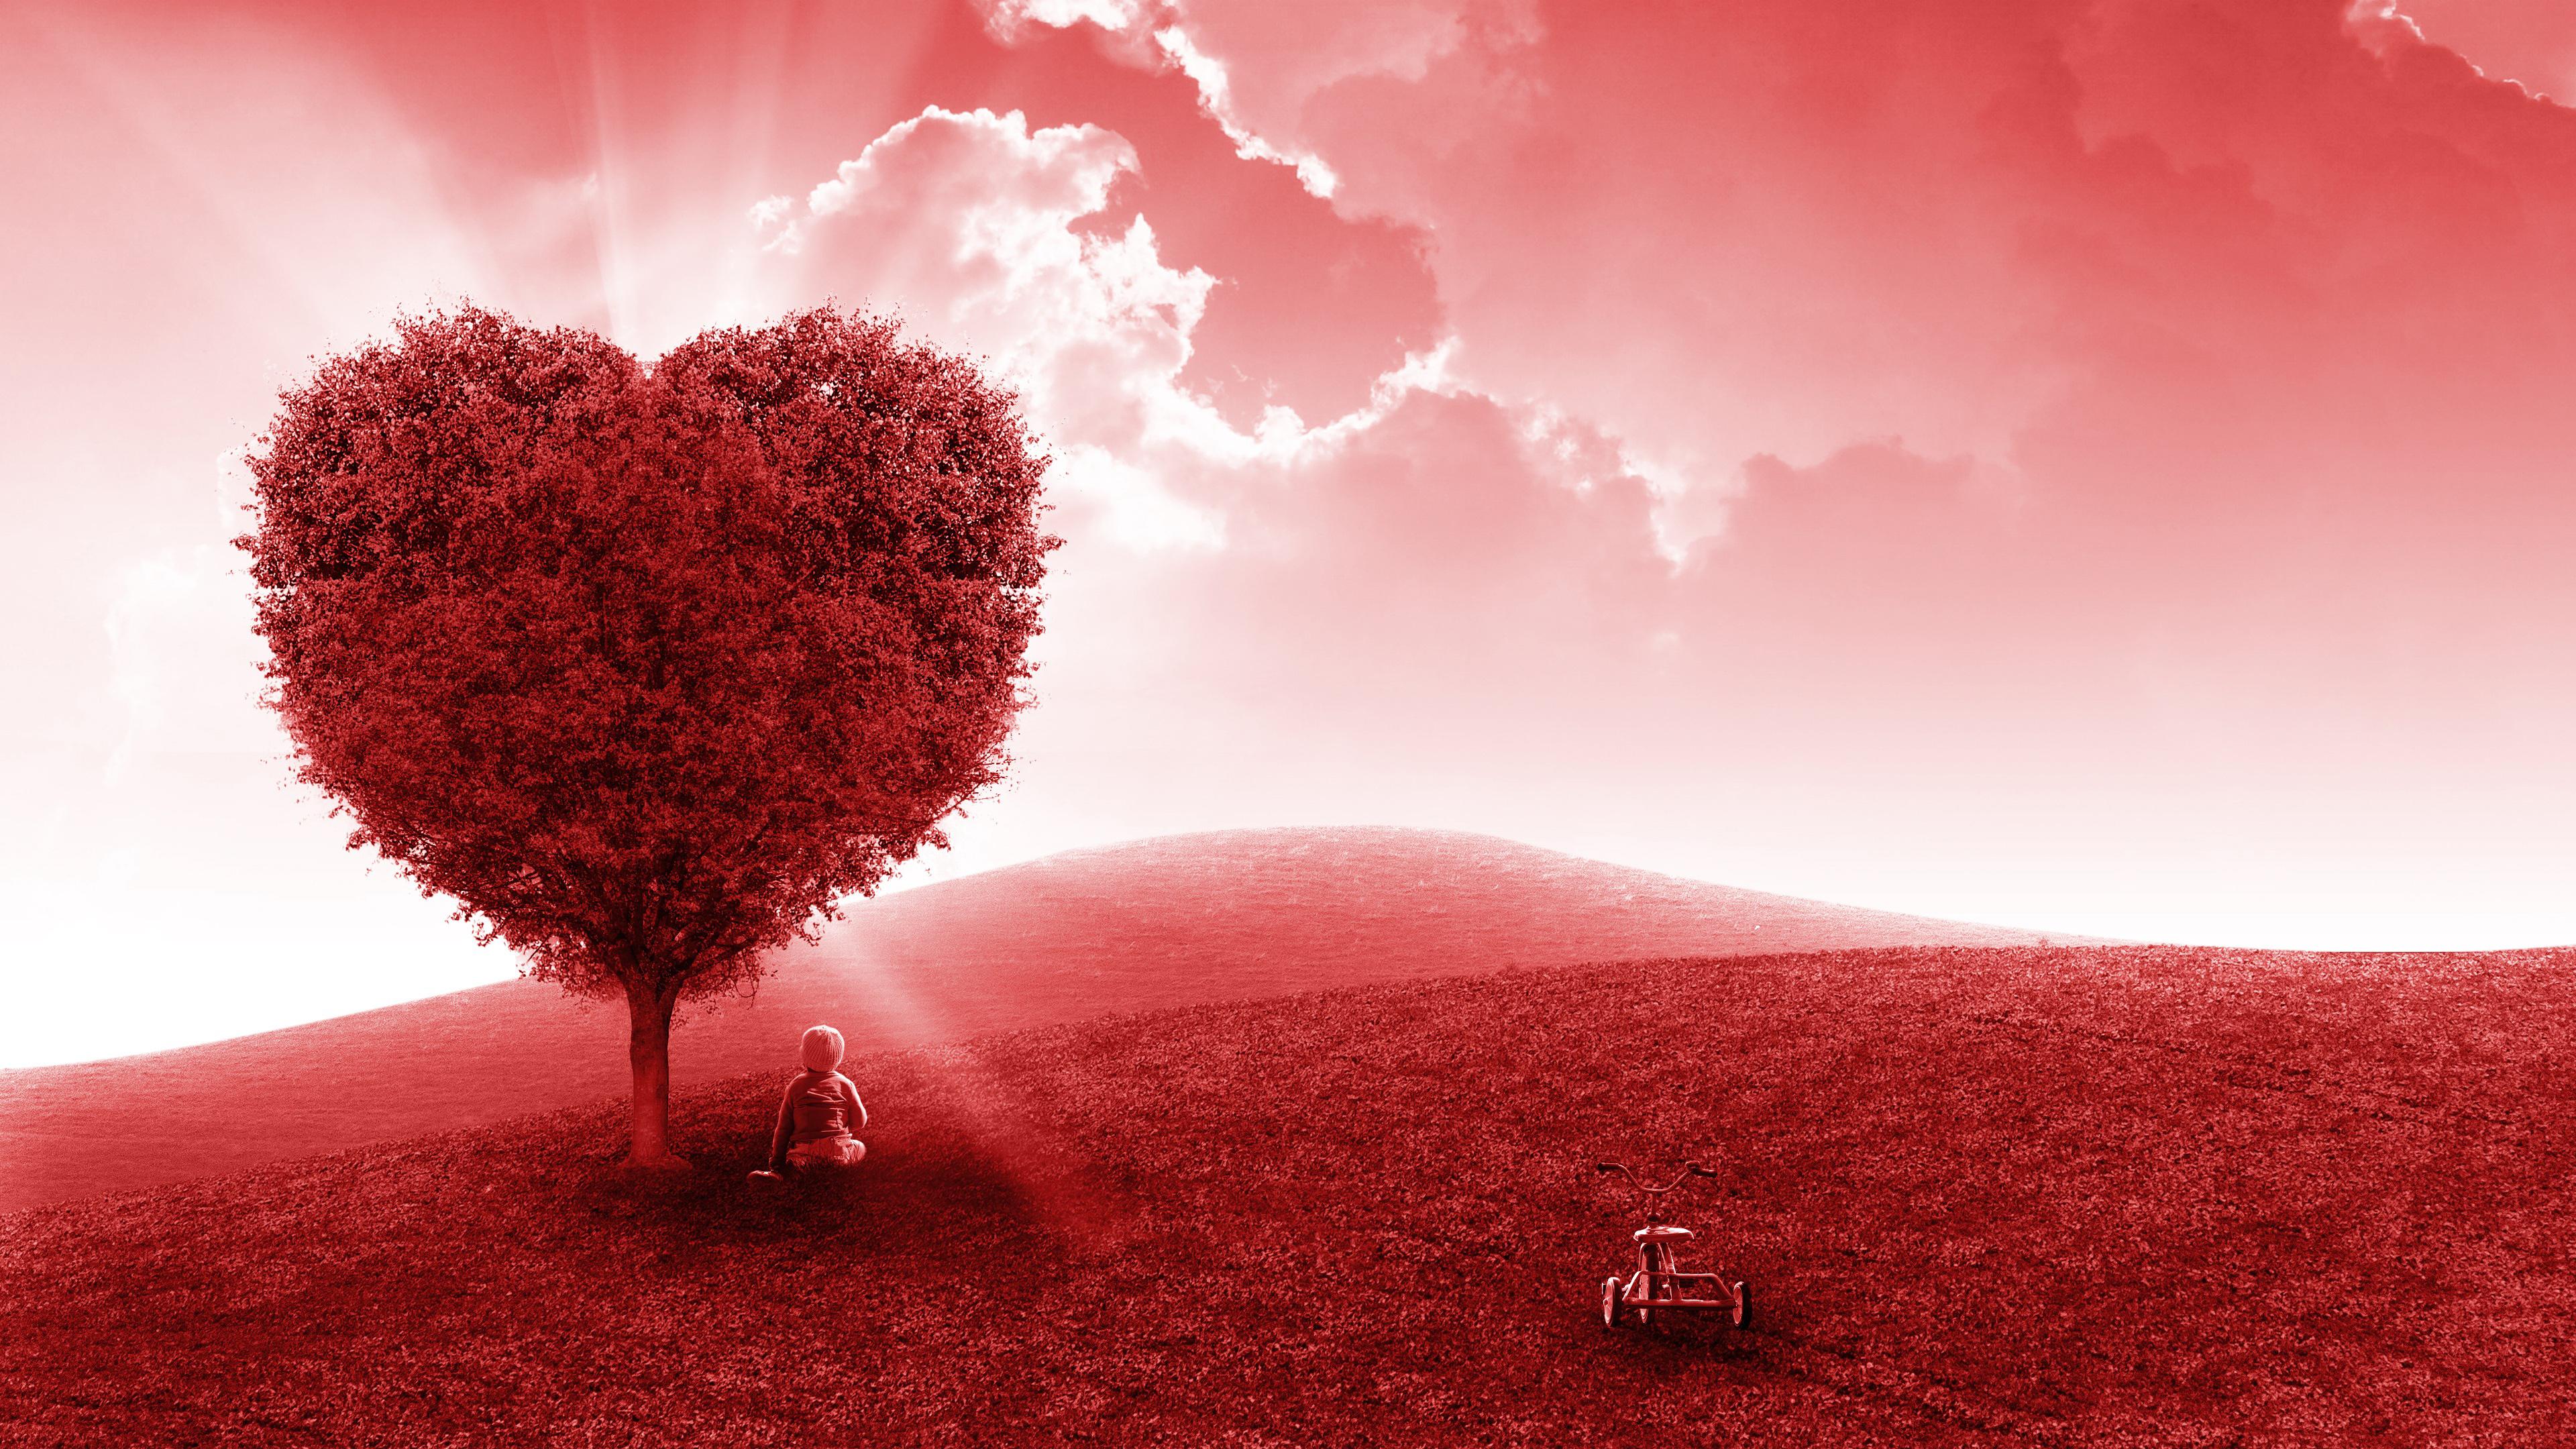 Romantic Nature Wallpaper Resolution - Love Cute Wallpapers Landscape - HD Wallpaper